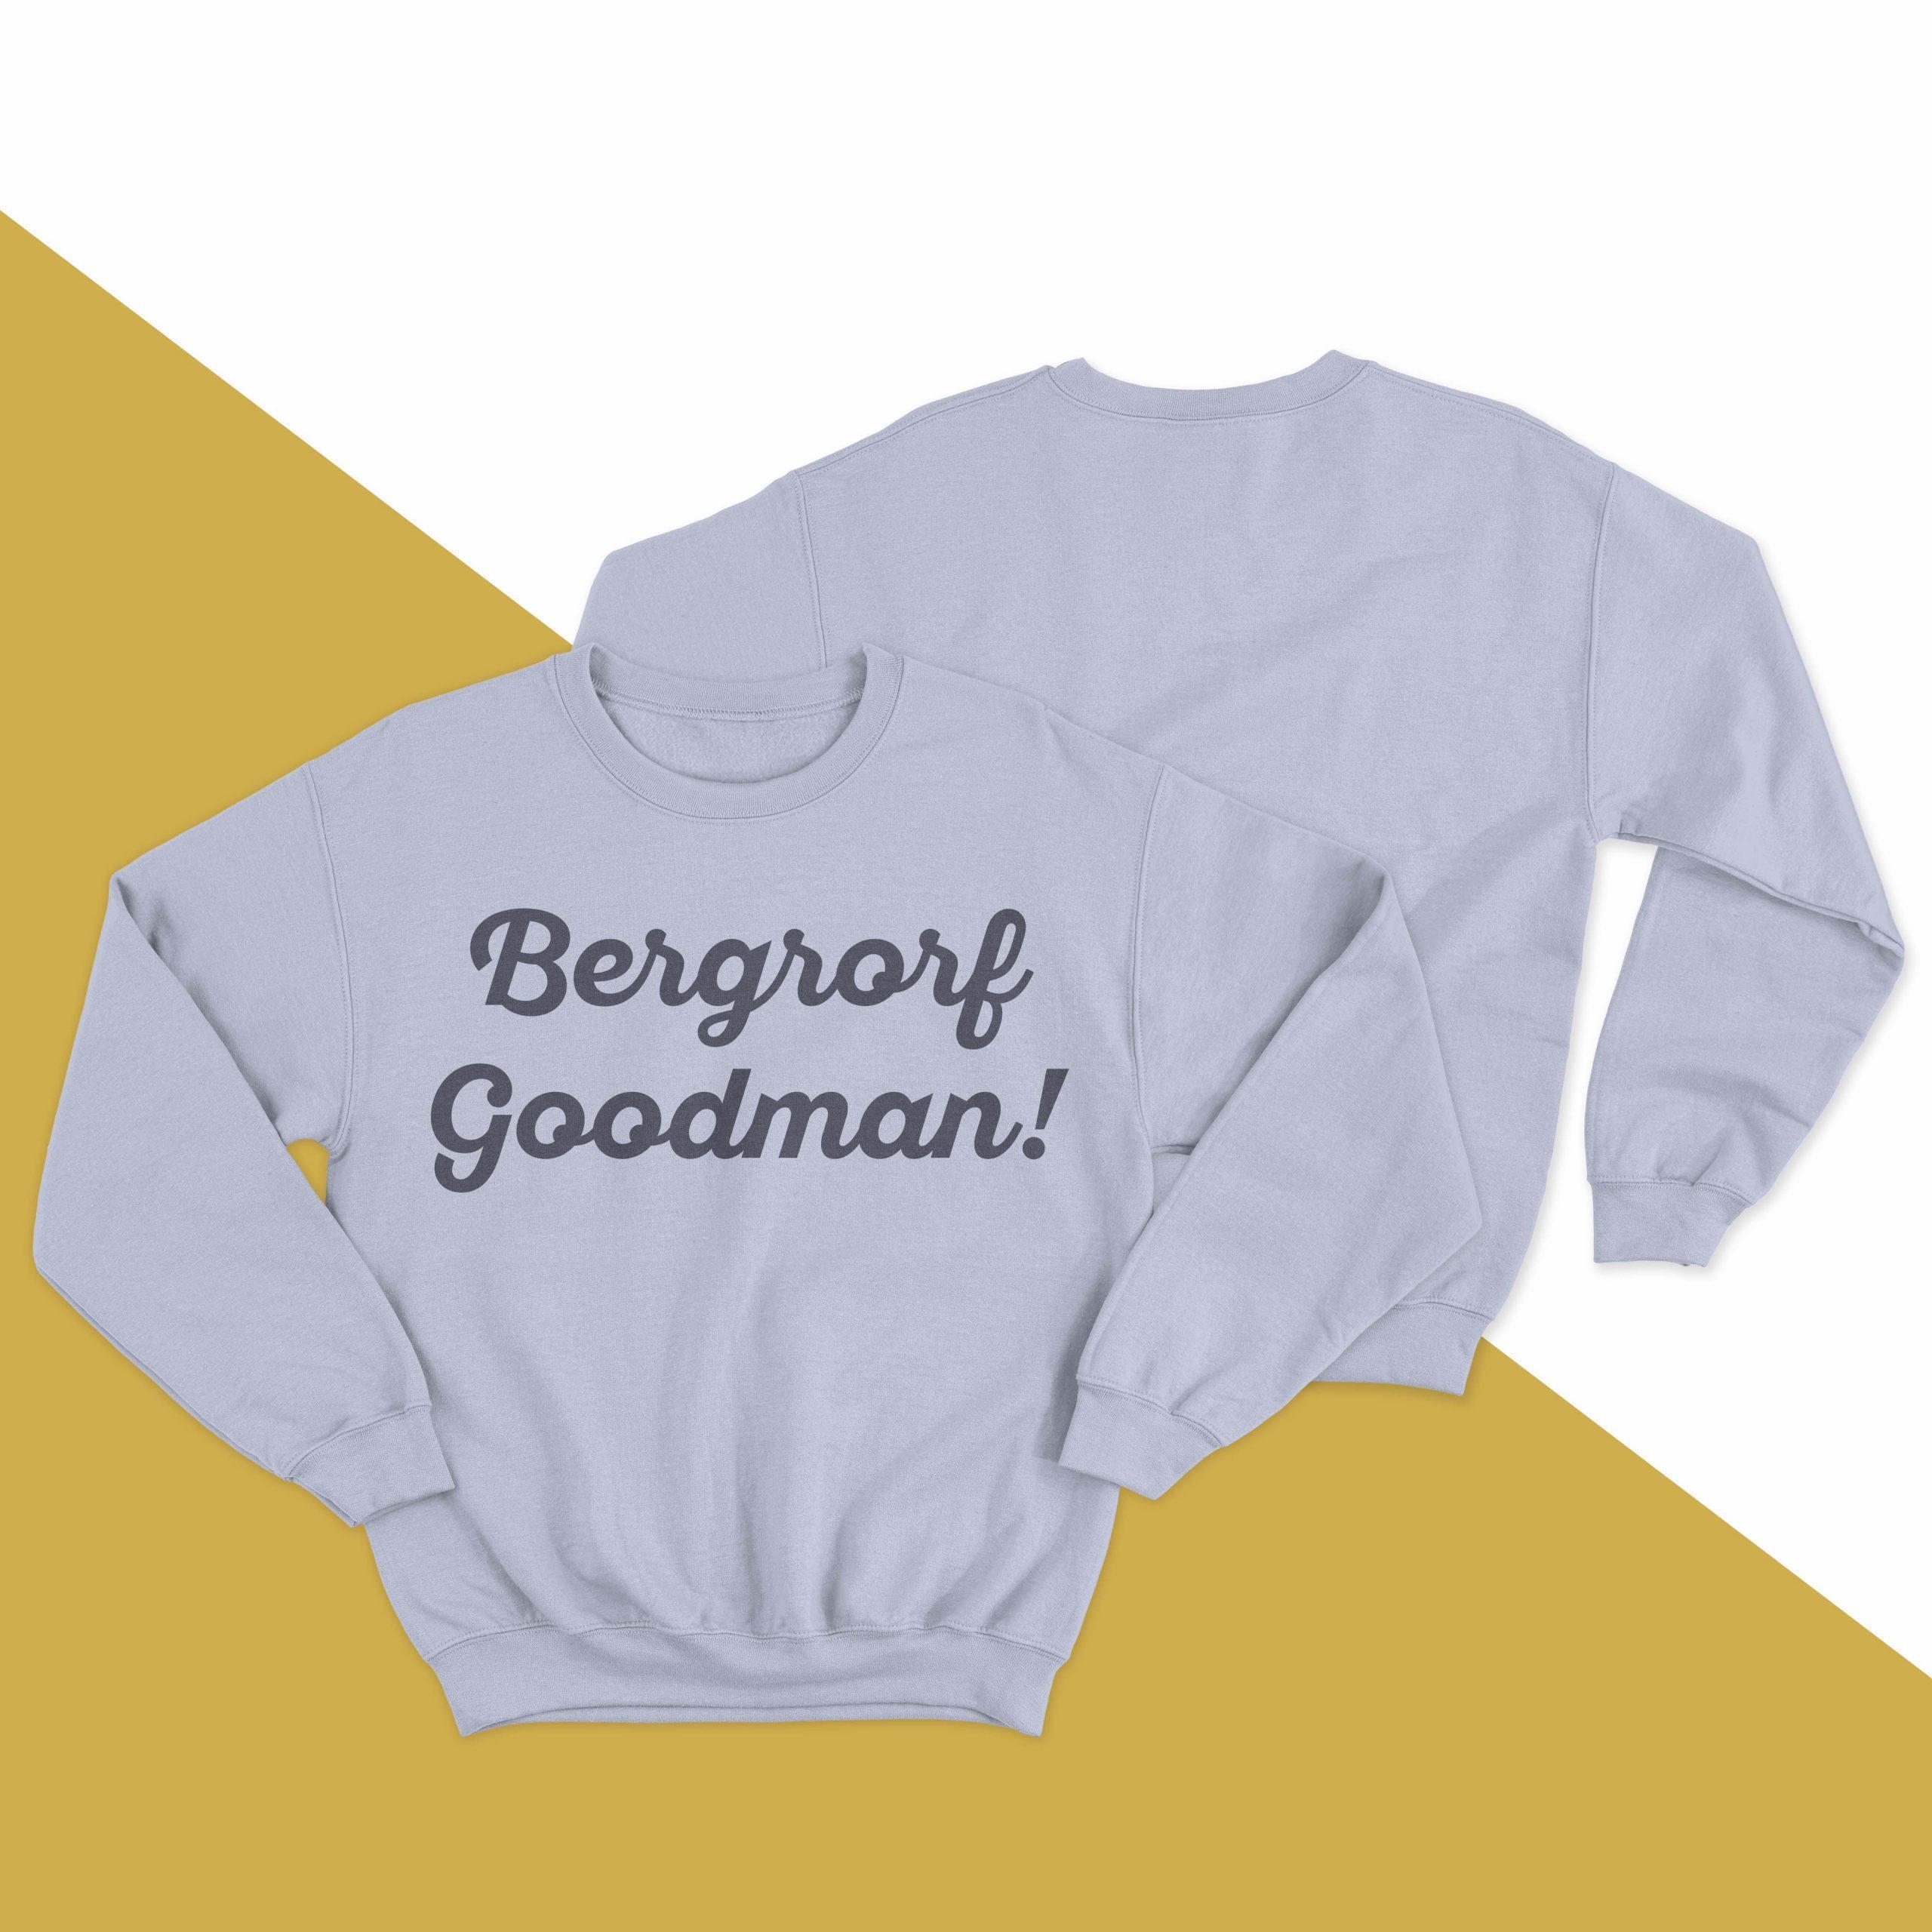 Wendy Williams Bergdorf Goodman T Tank Top